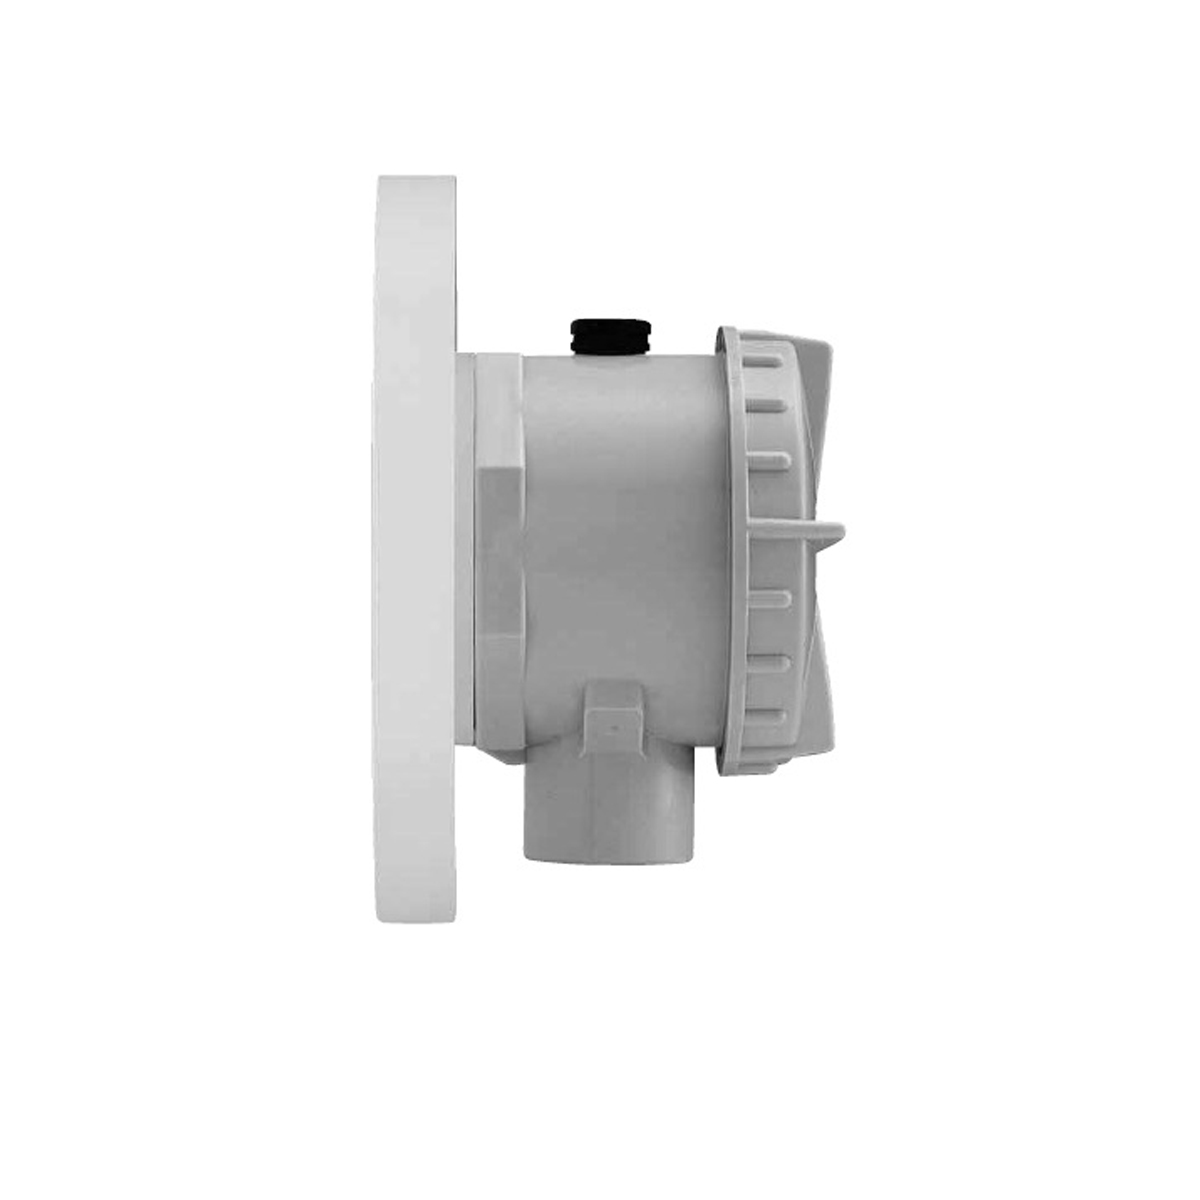 NOHKEN PK120series เครื่องวัดระดับของเหลวแบบใช้ความดัน